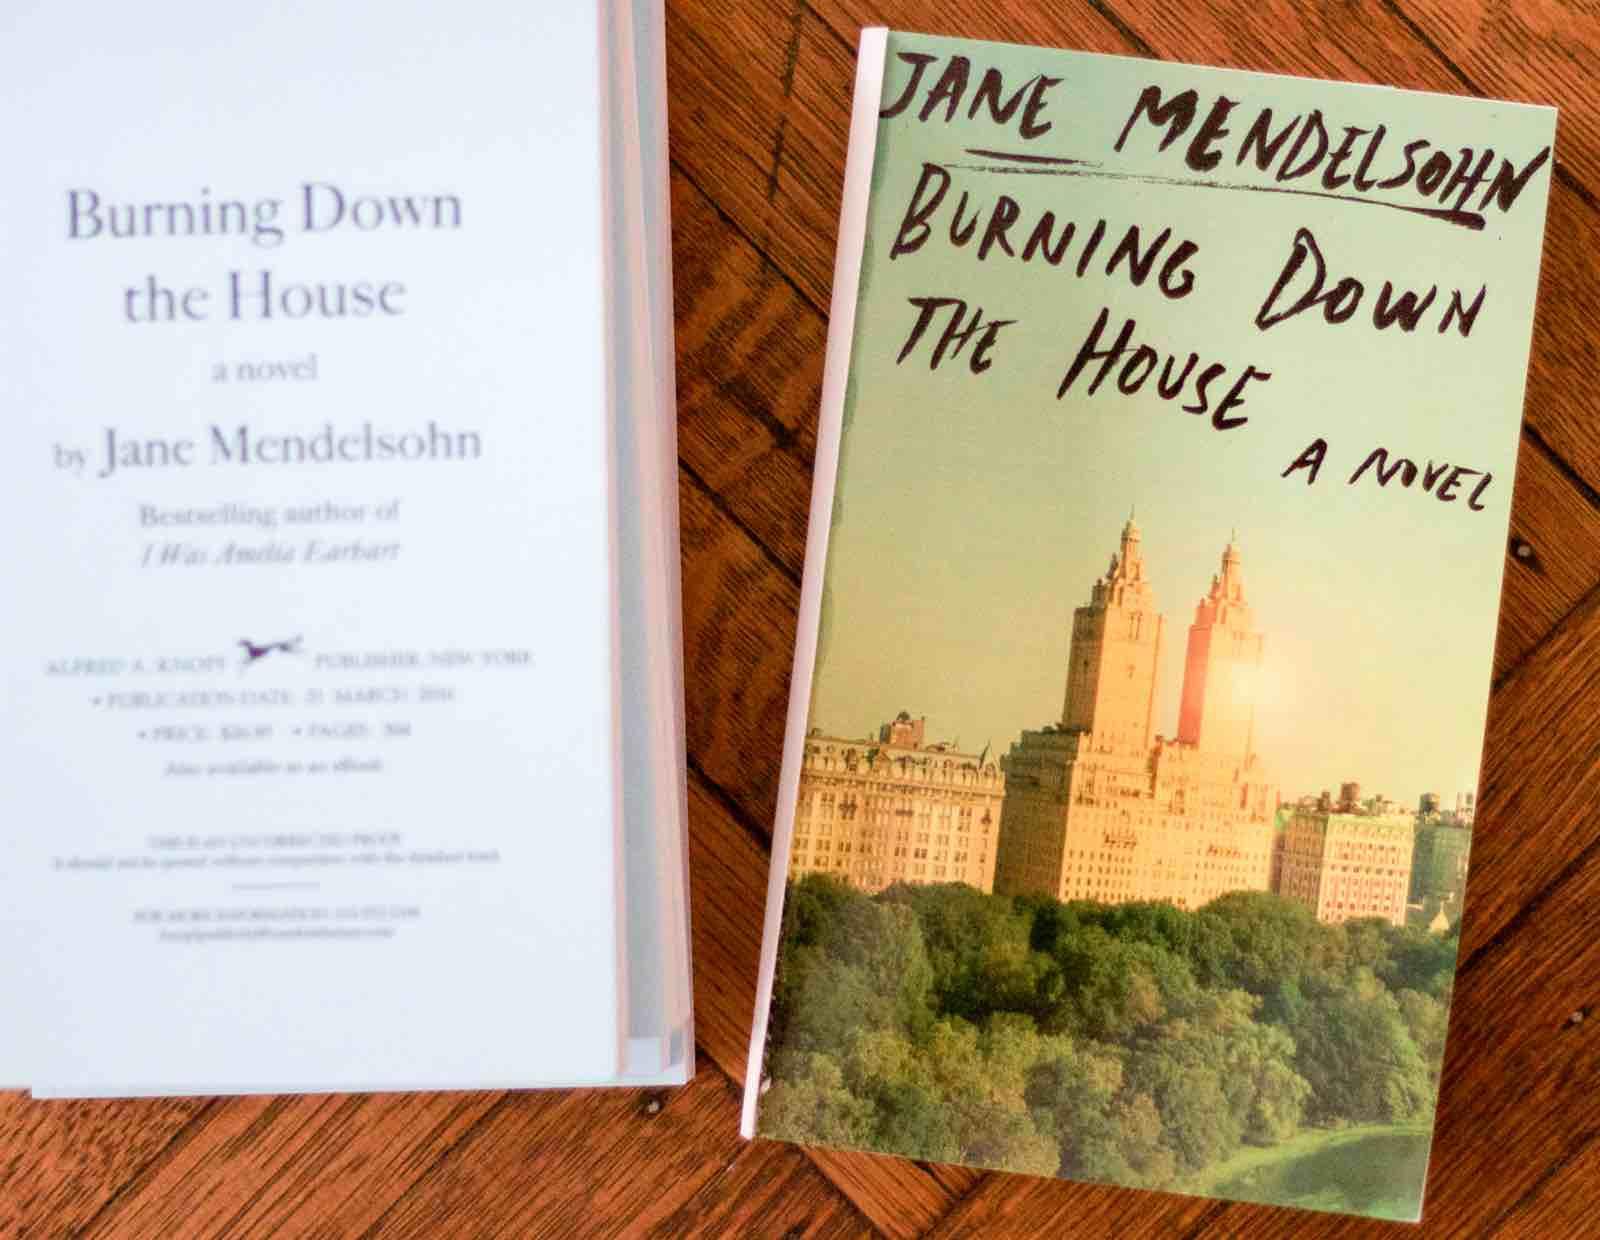 Novelist, Writer, Jane Mendelsohn at home, Advance Copy of Burning Down the House | Fabulous Fabsters